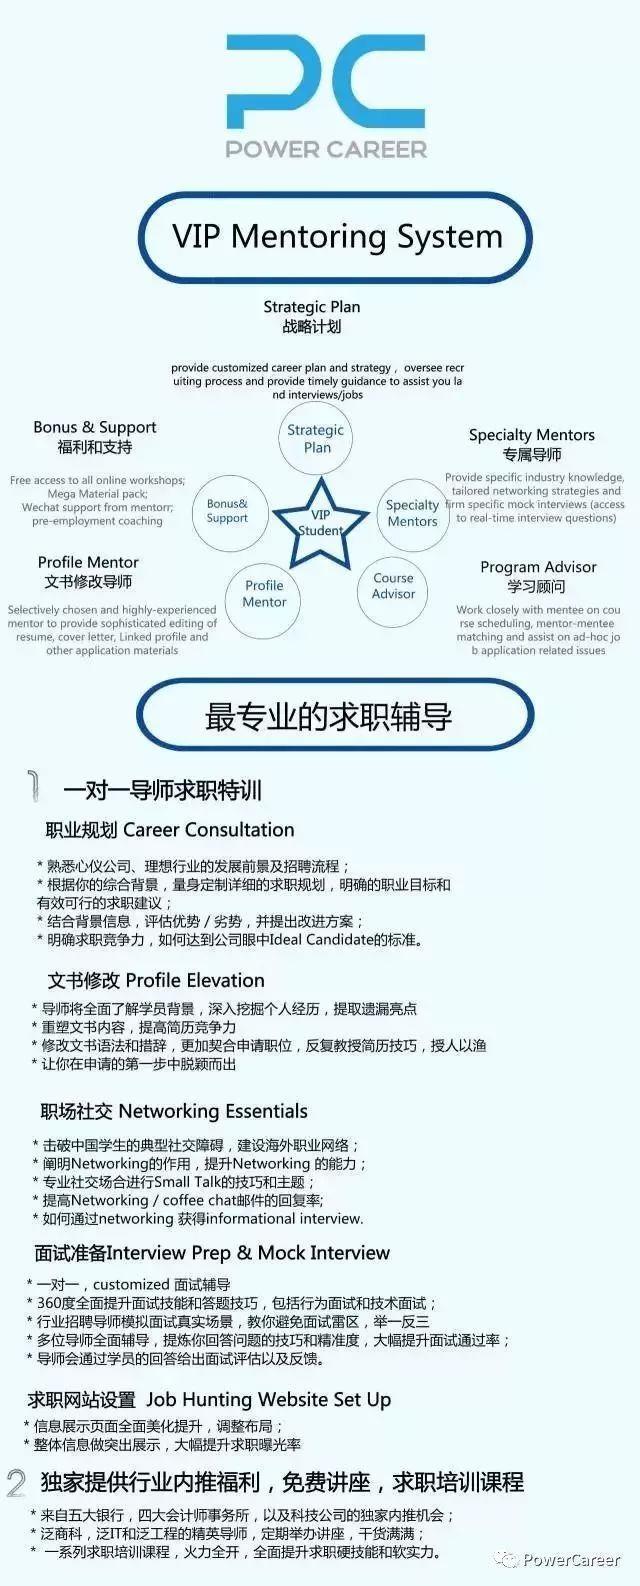 Offer 捷报 |恭喜PC学员斩获University Finance Assistant 实习offer!